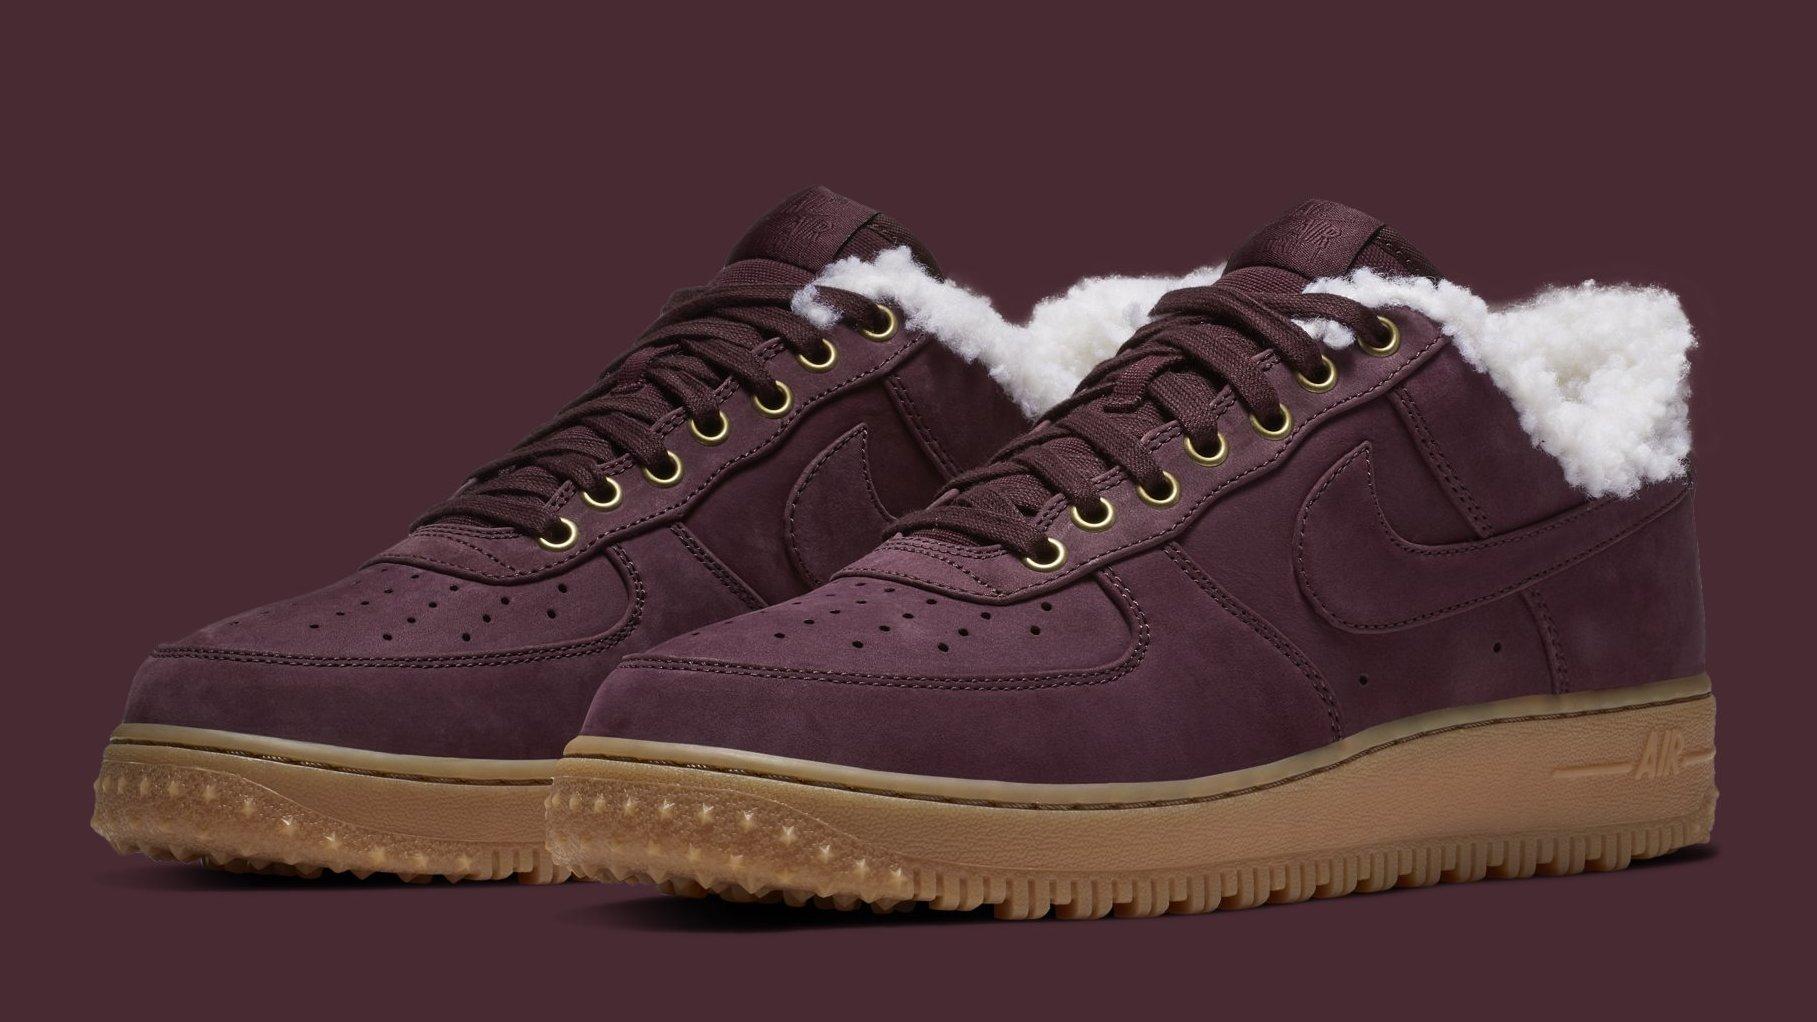 Verter Historiador Perceptivo  Nike Air Force 1 Premium Winter 'Burgundy Crush/Gum Light Brown' AV2874-600  Release Date | Sole Collector